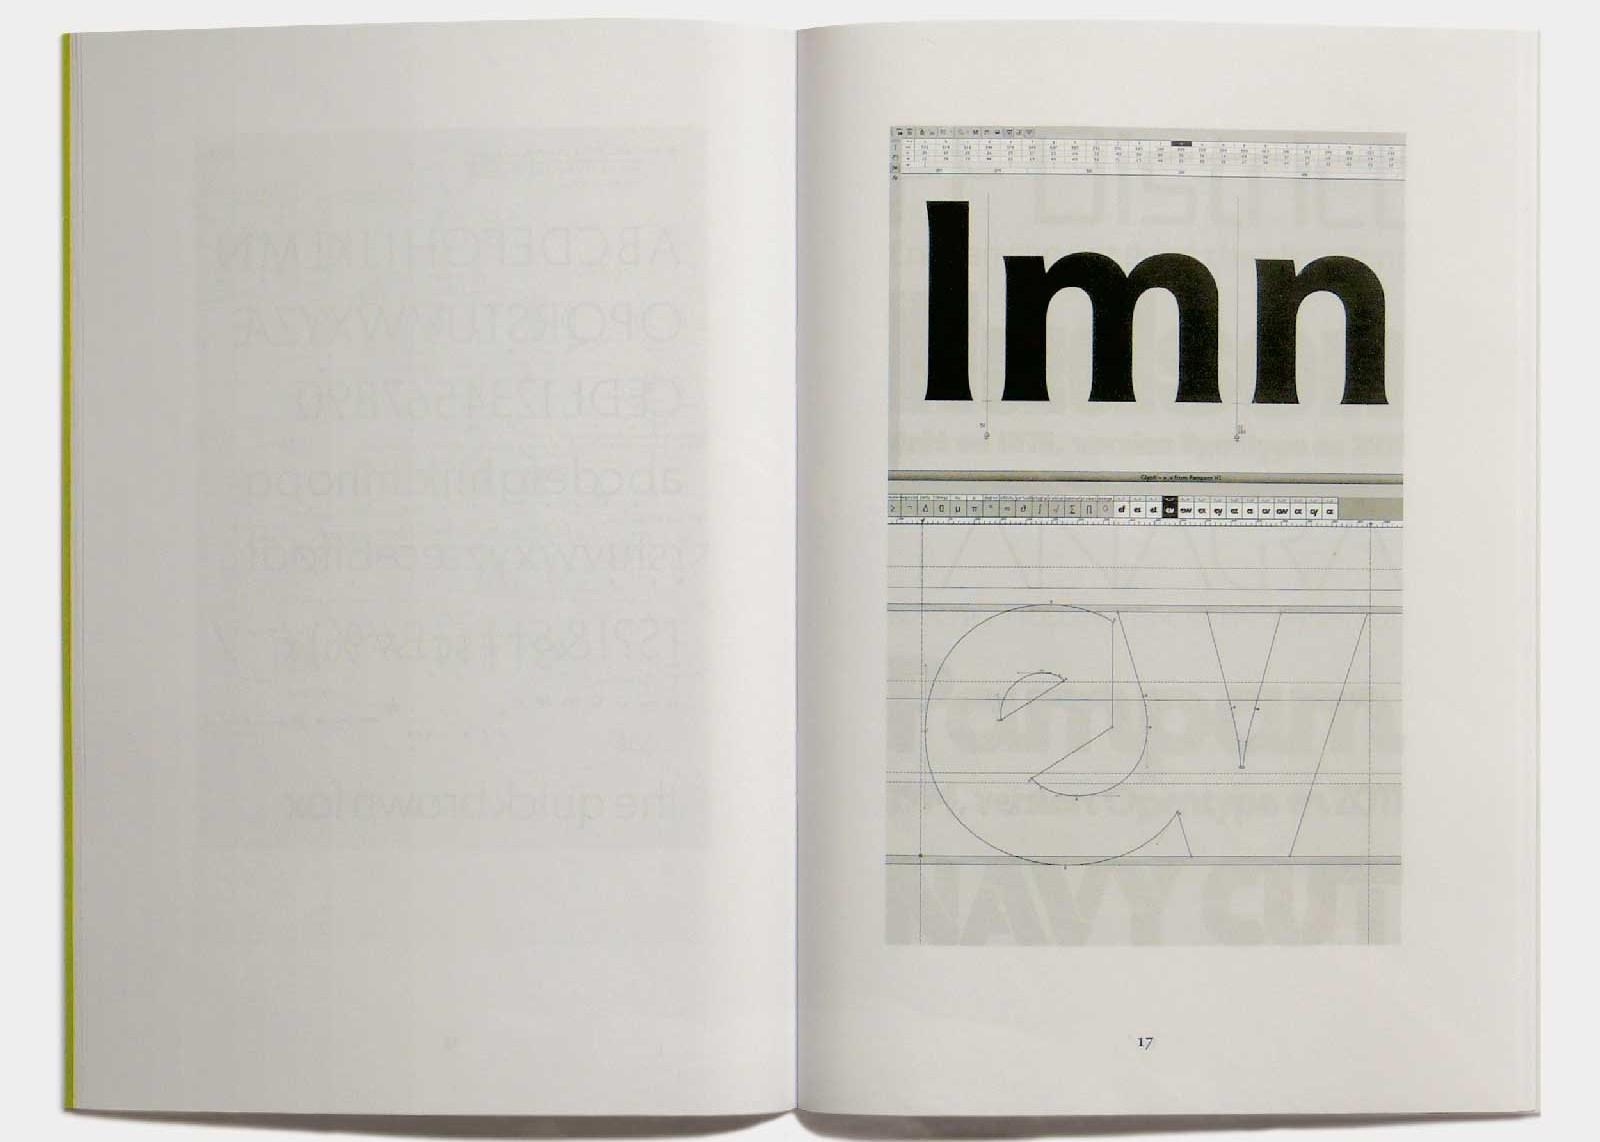 Page 17 — Caractère Edelweiss (2011, inédit), Pampam (1974, Hollenstein; 2011, version OpenType), capture d'écran.